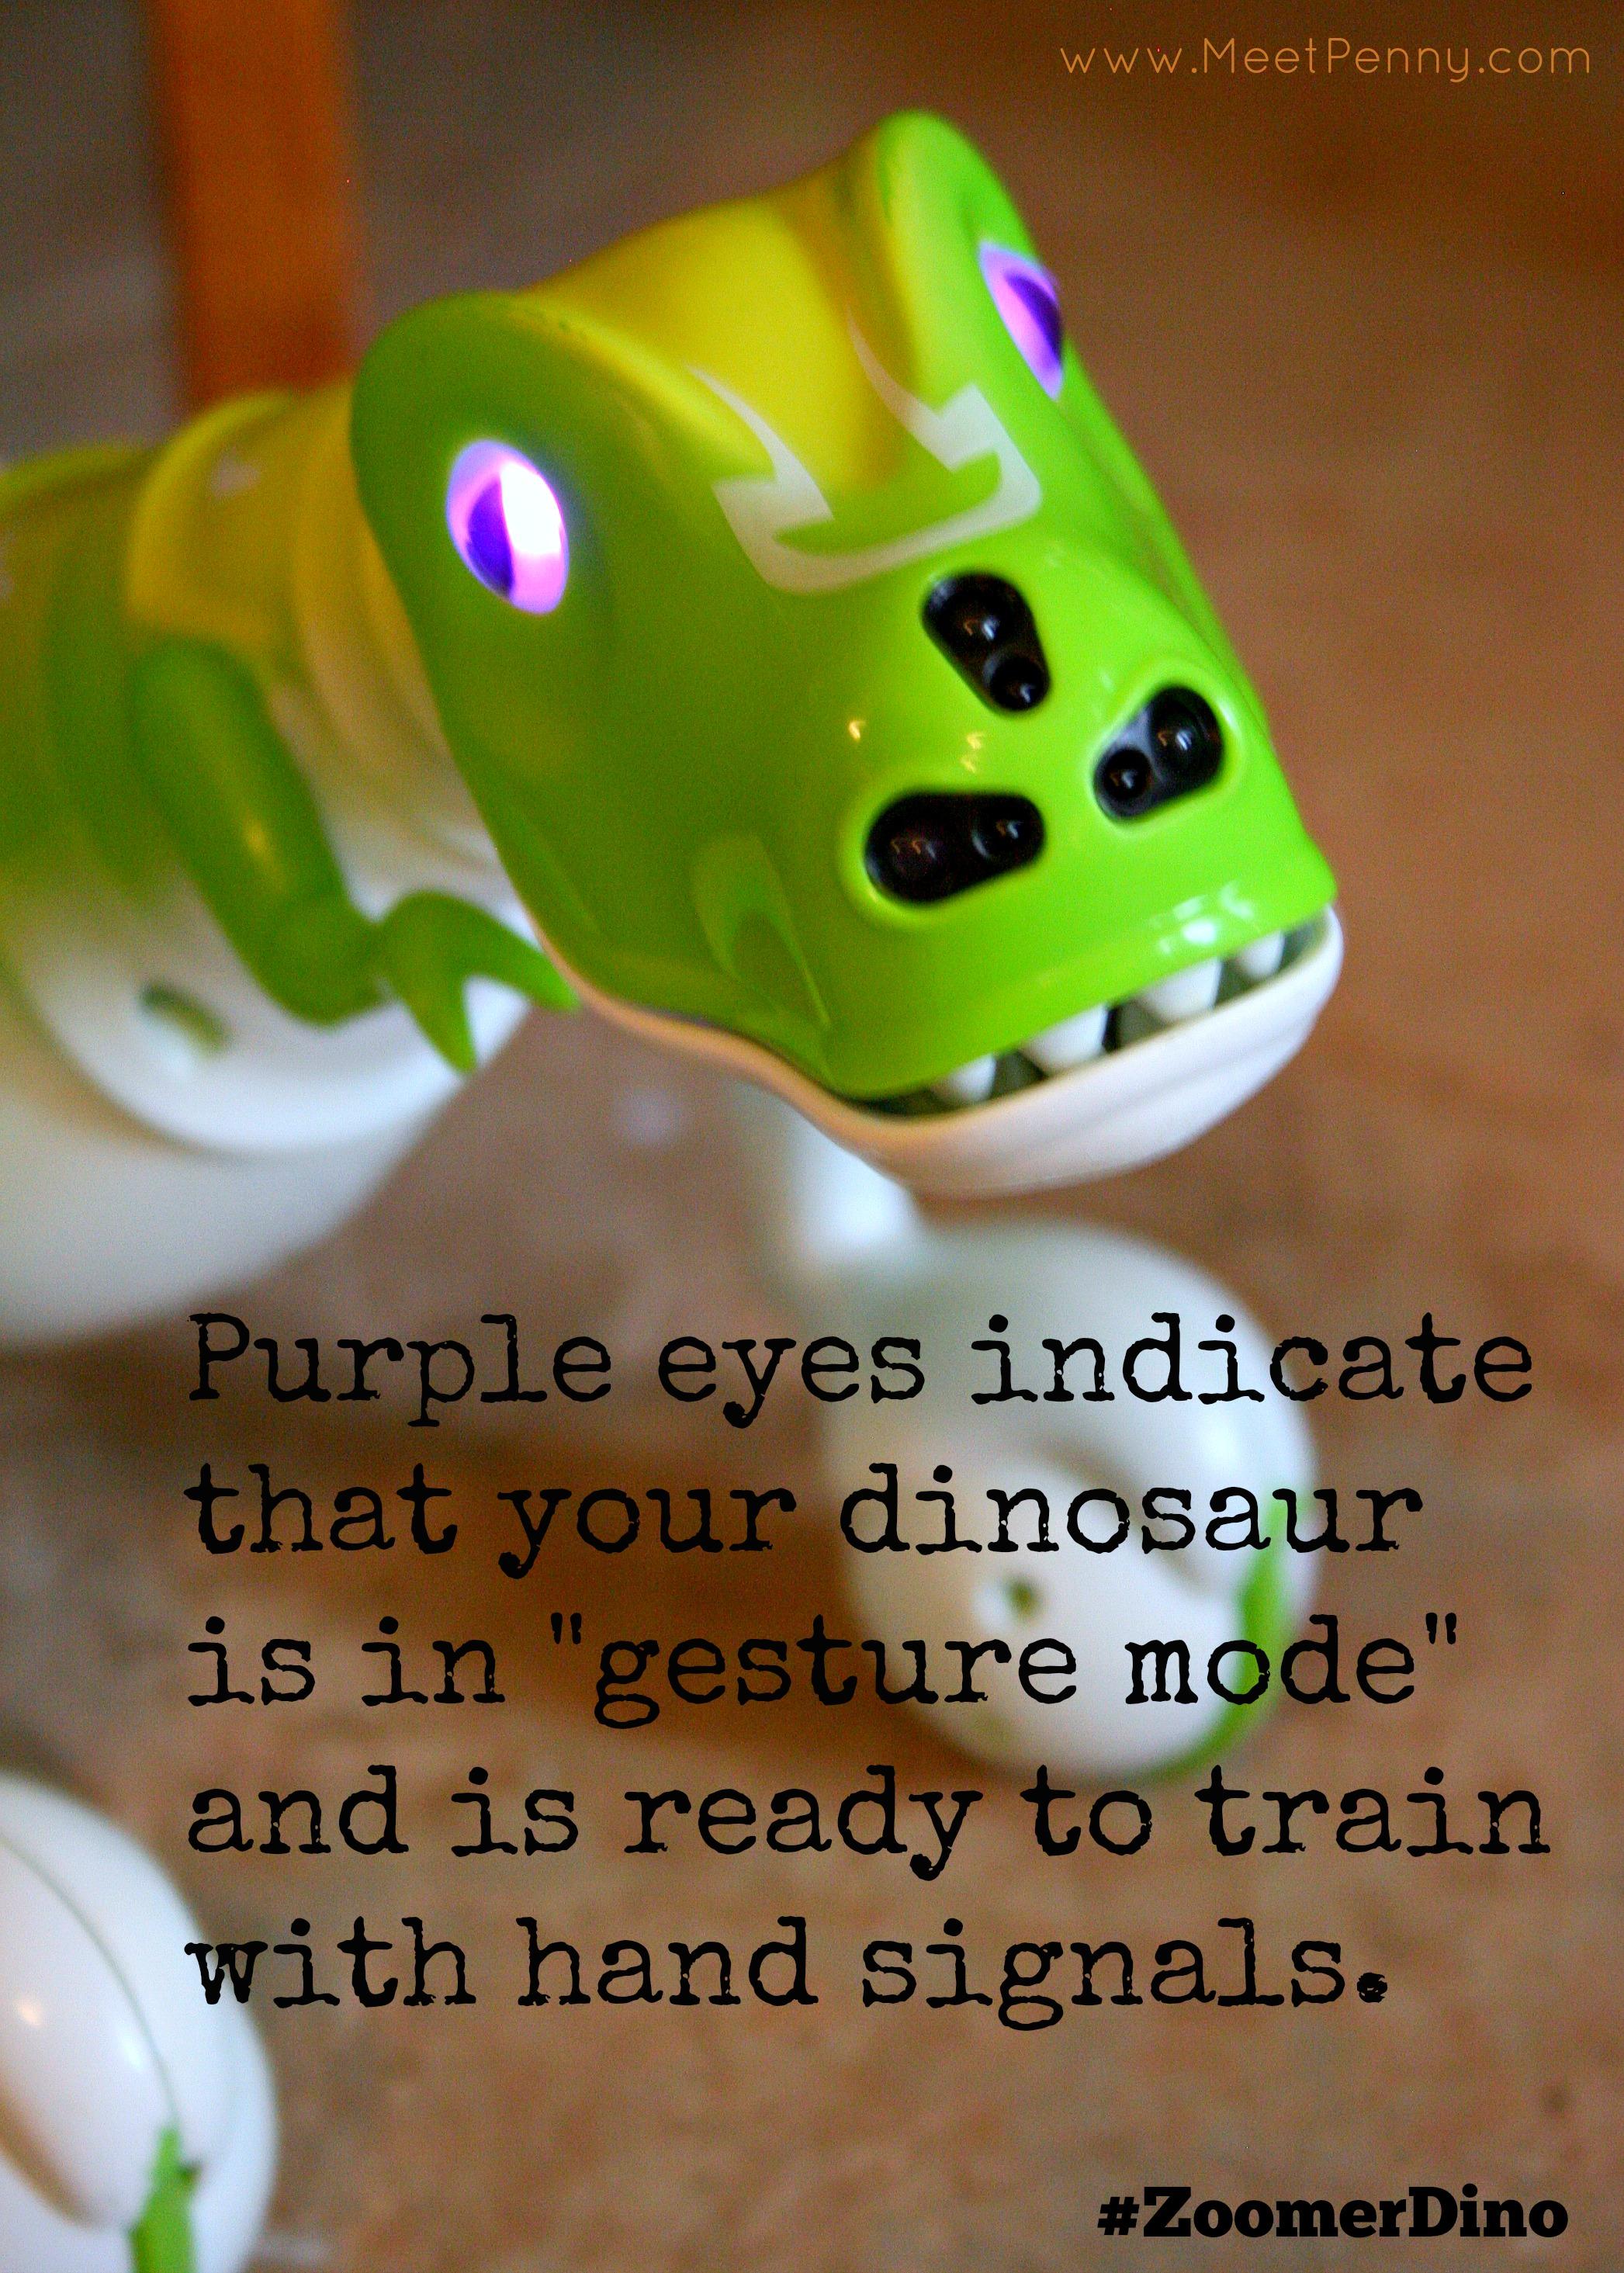 Zoomer Dino Video Zoomer Dino Purple Eyes